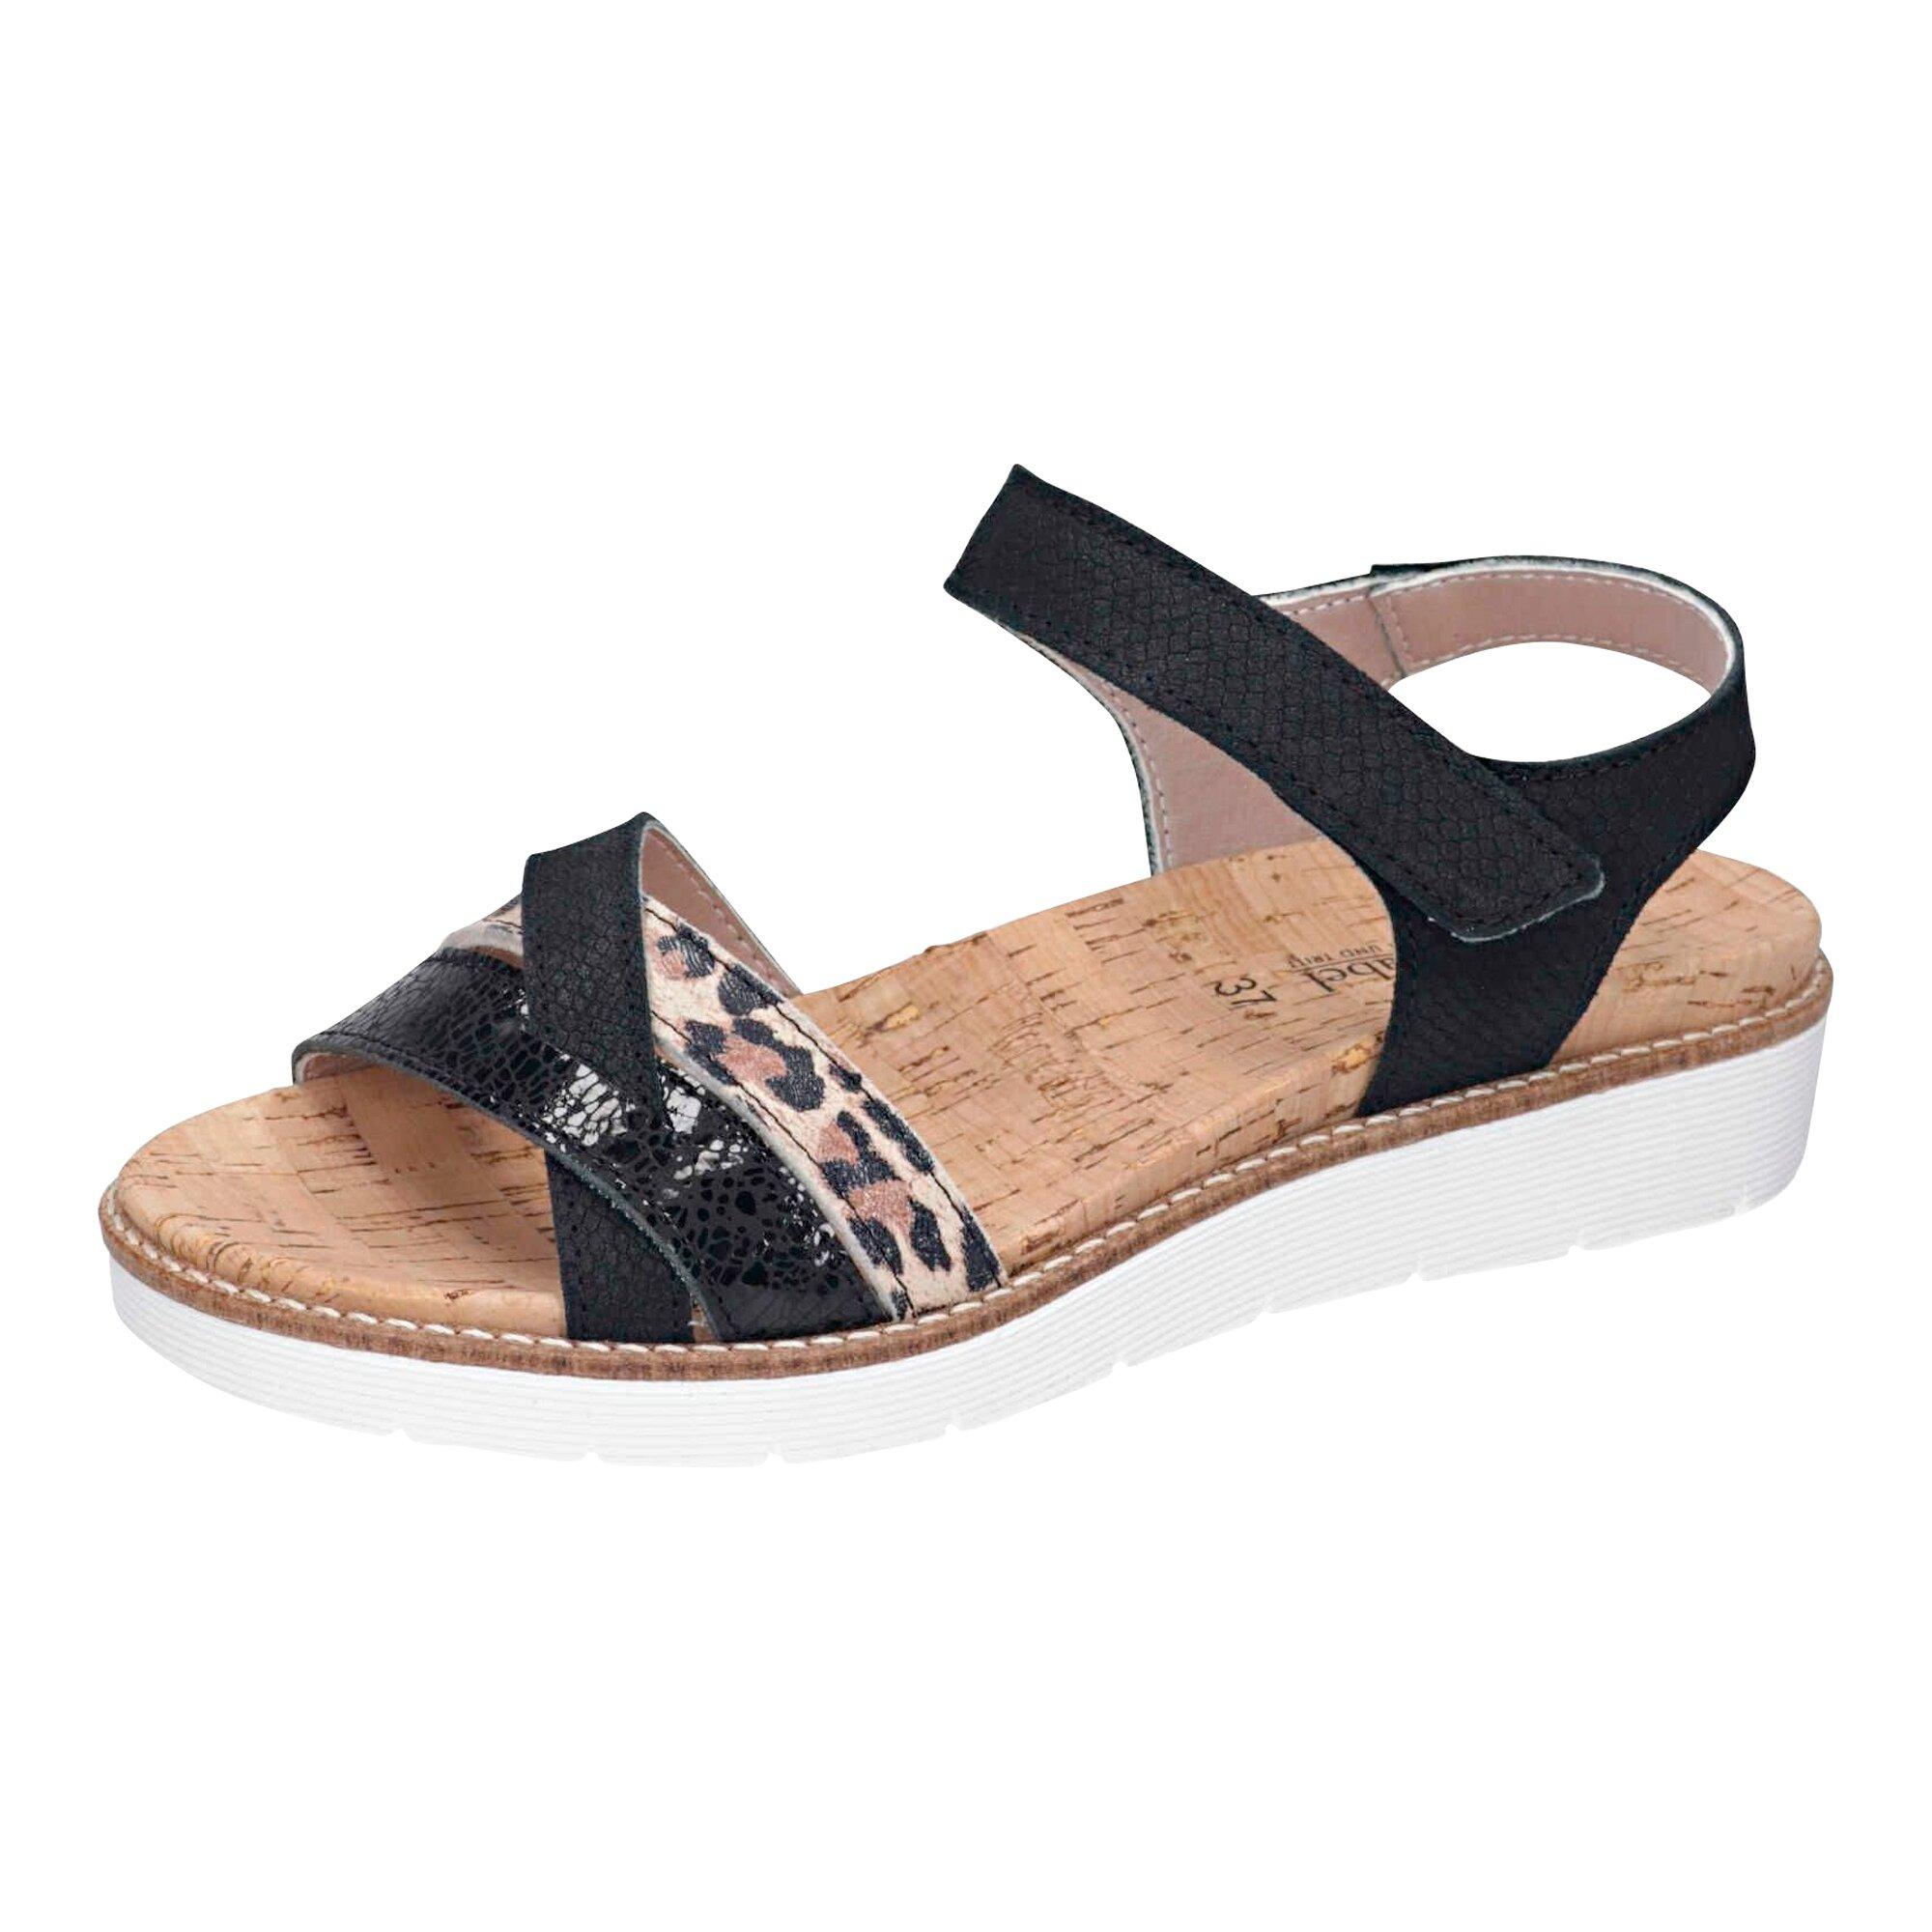 "Image of Damen-Sandalette ""Heike"""